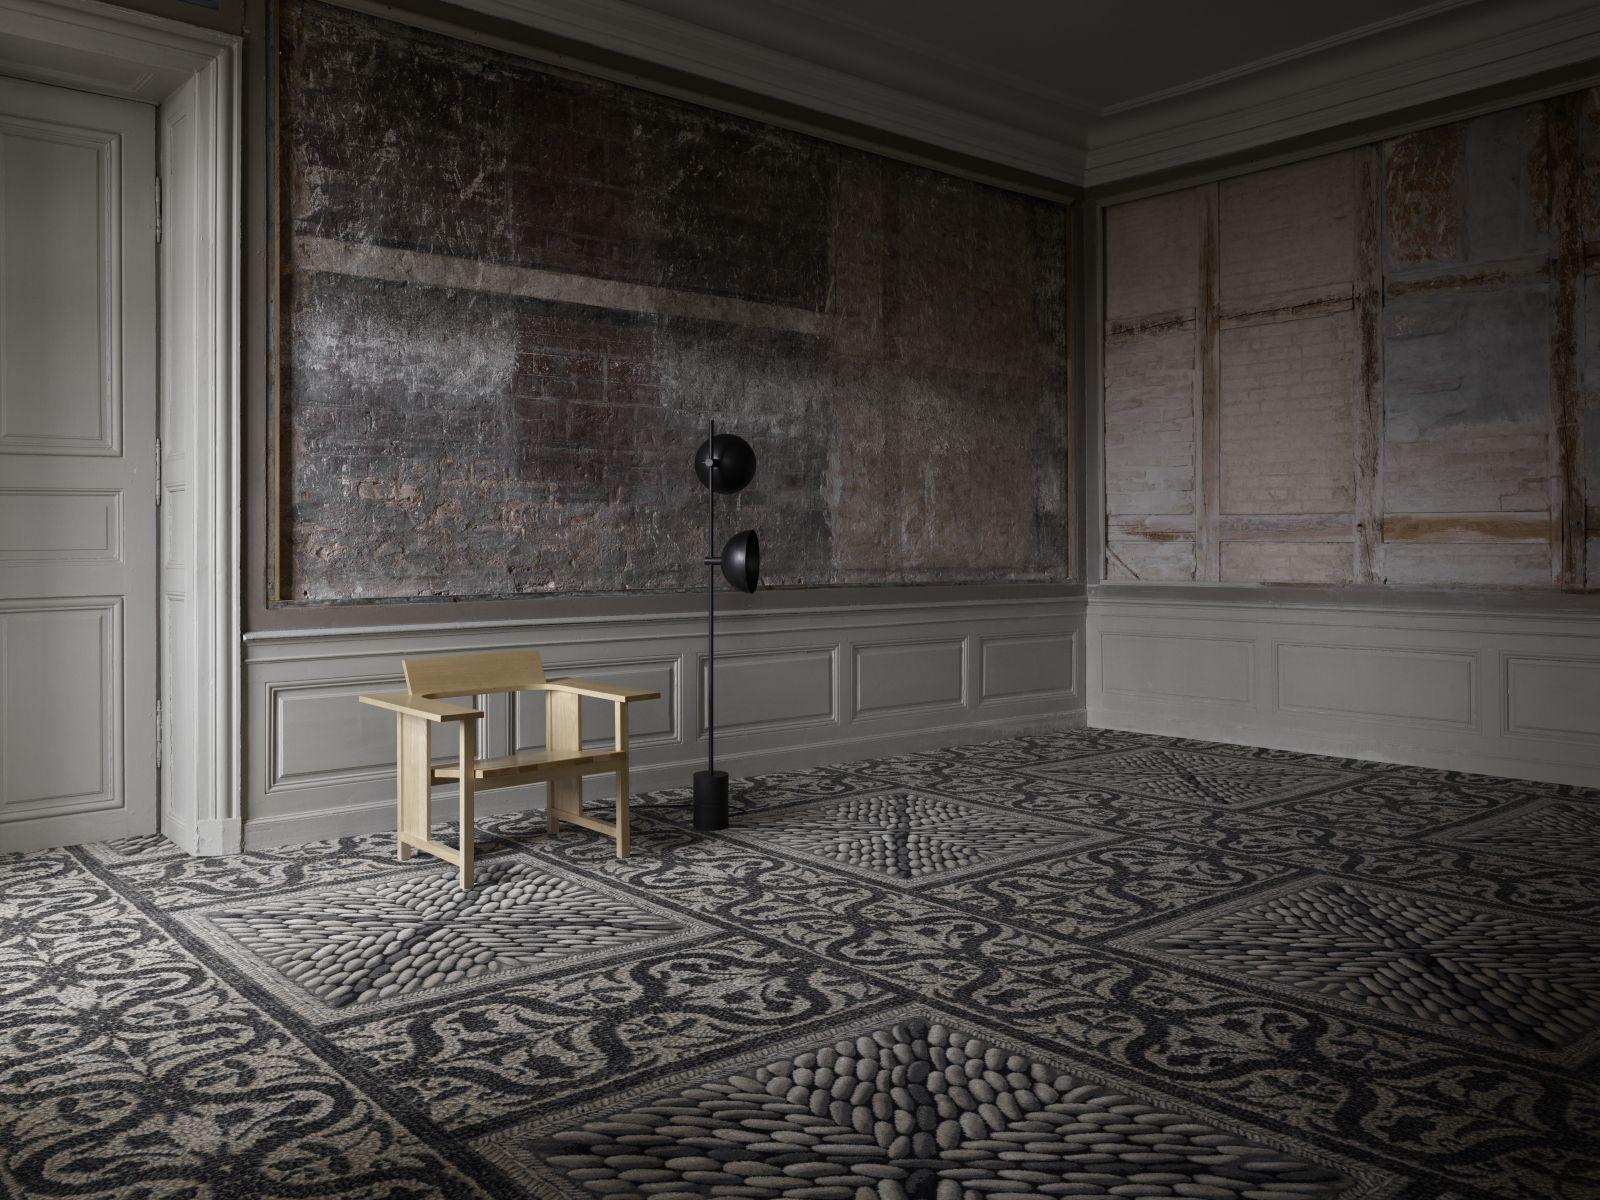 Atelier Calades Corridor. Kolekcja projektu Christiana Lacroixa dla EGE.